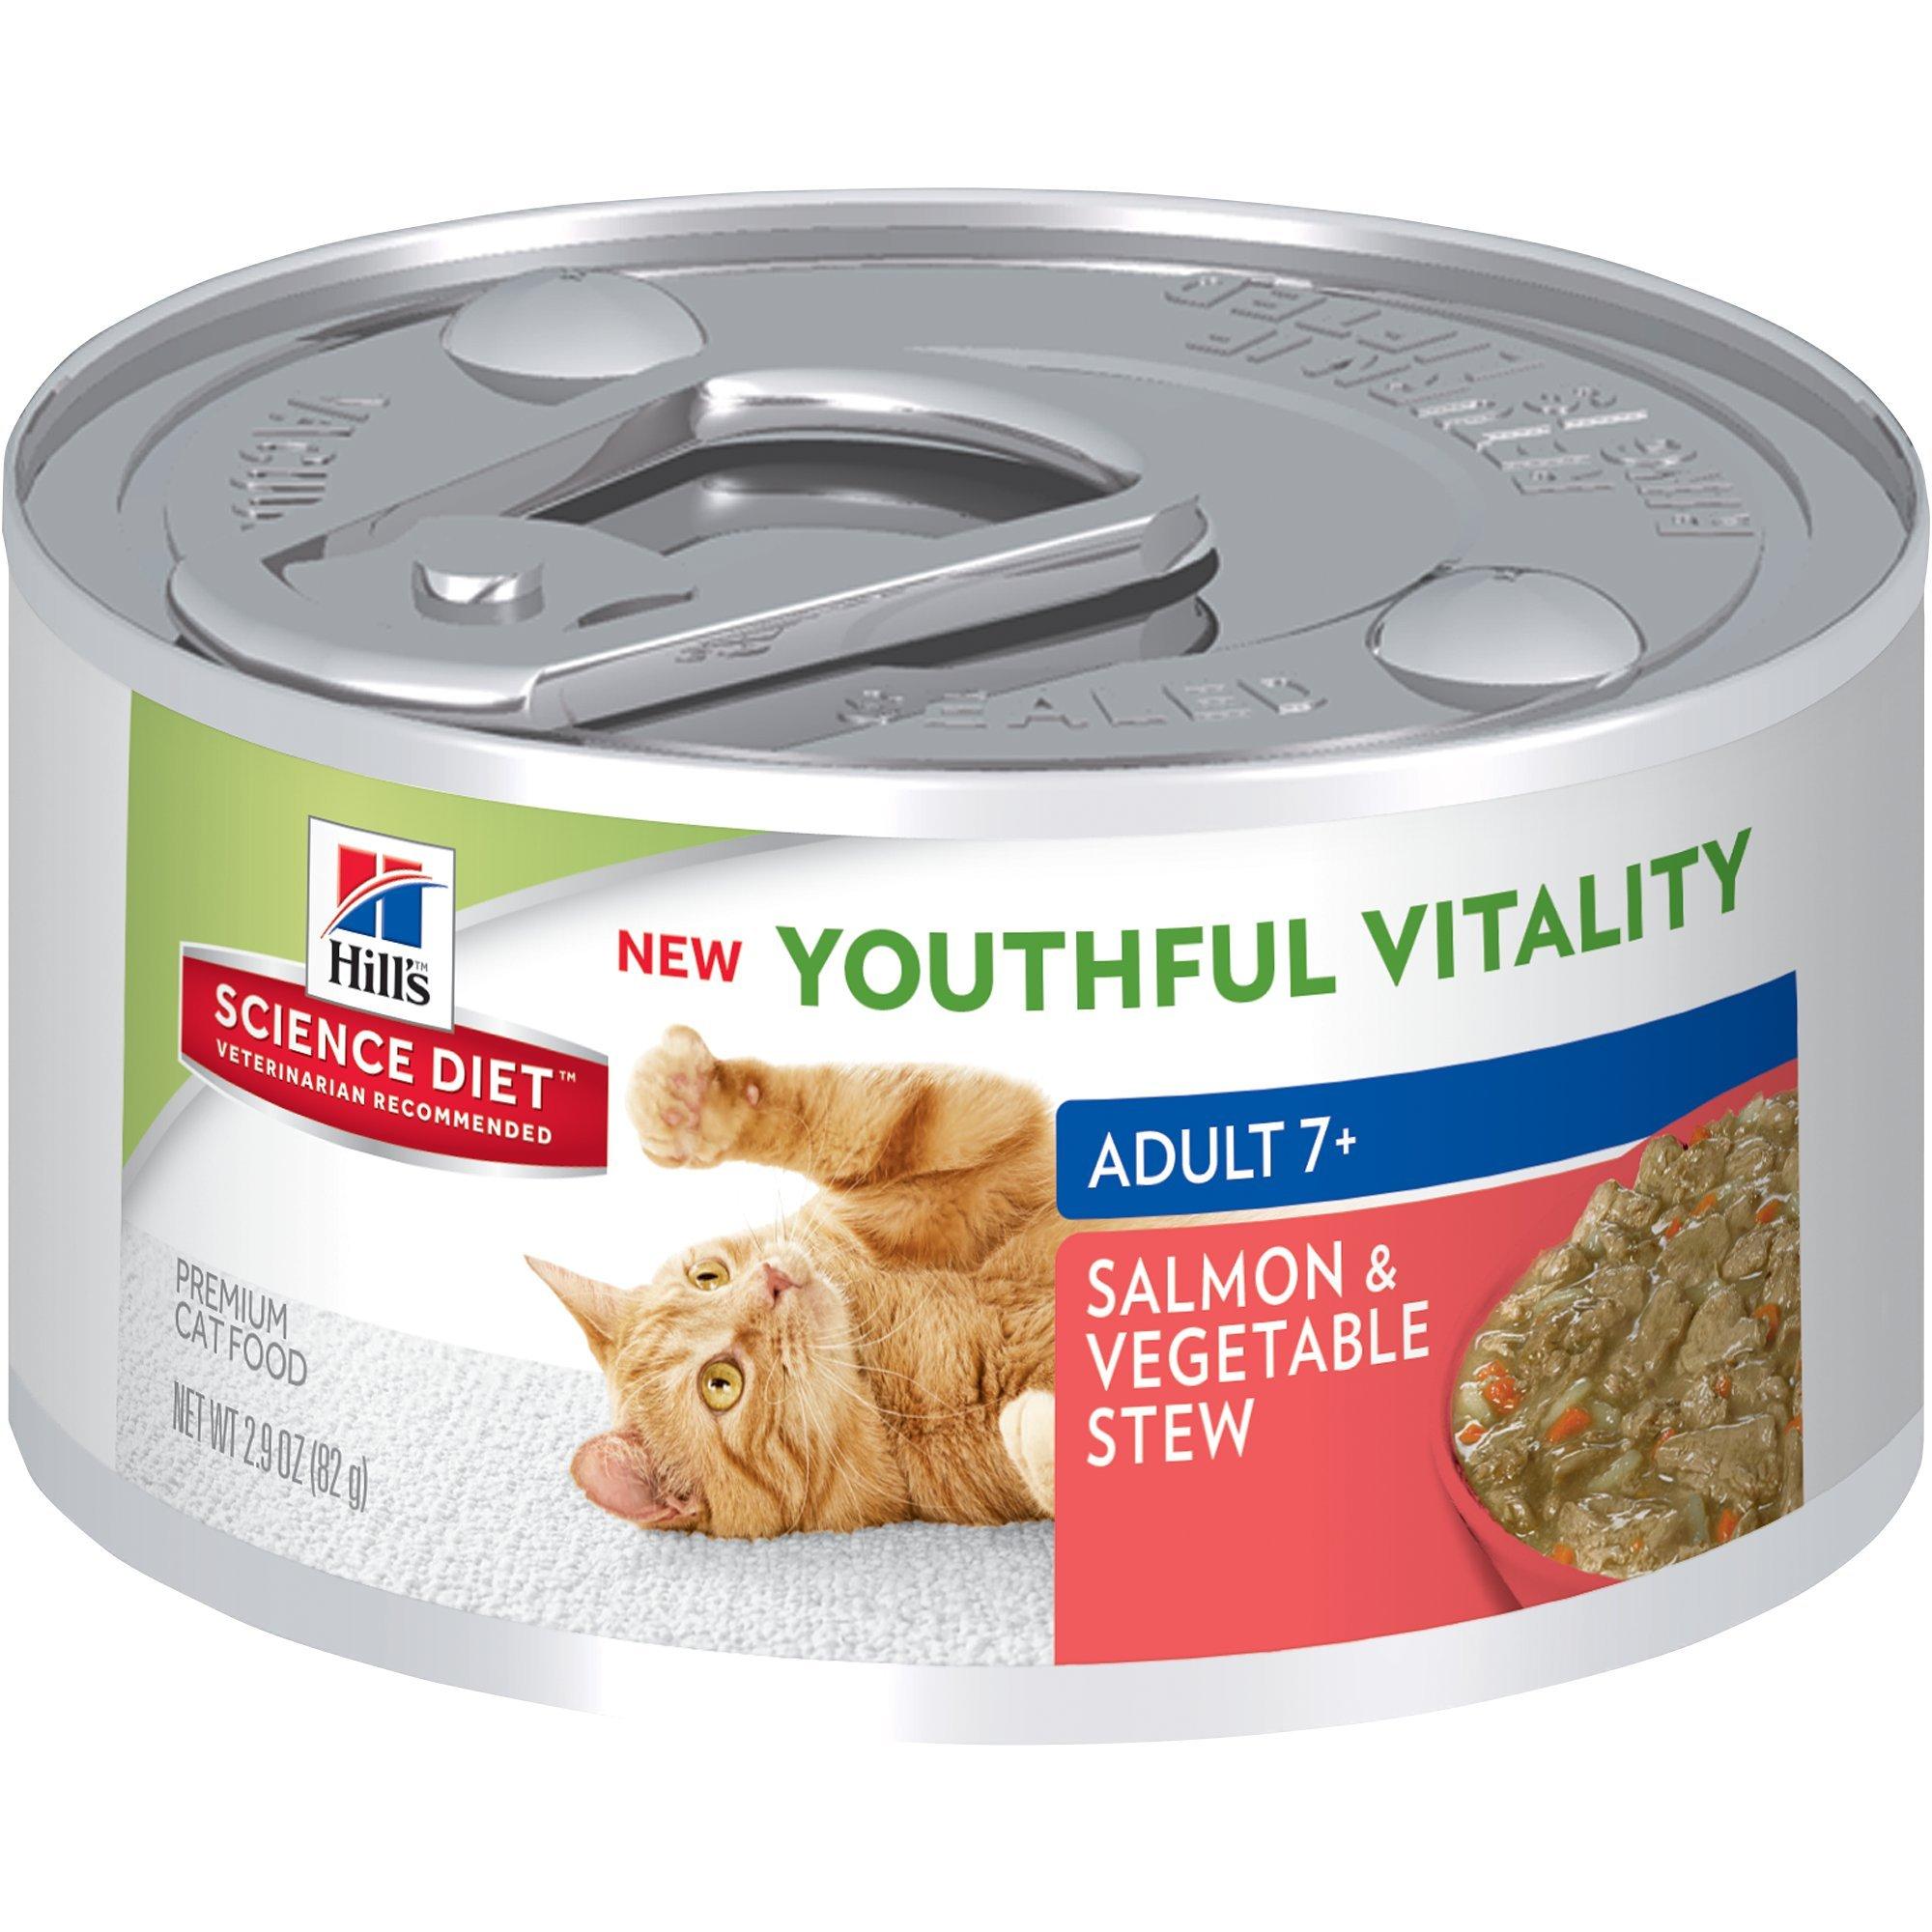 Hill's Science Diet Senior Wet Cat Food